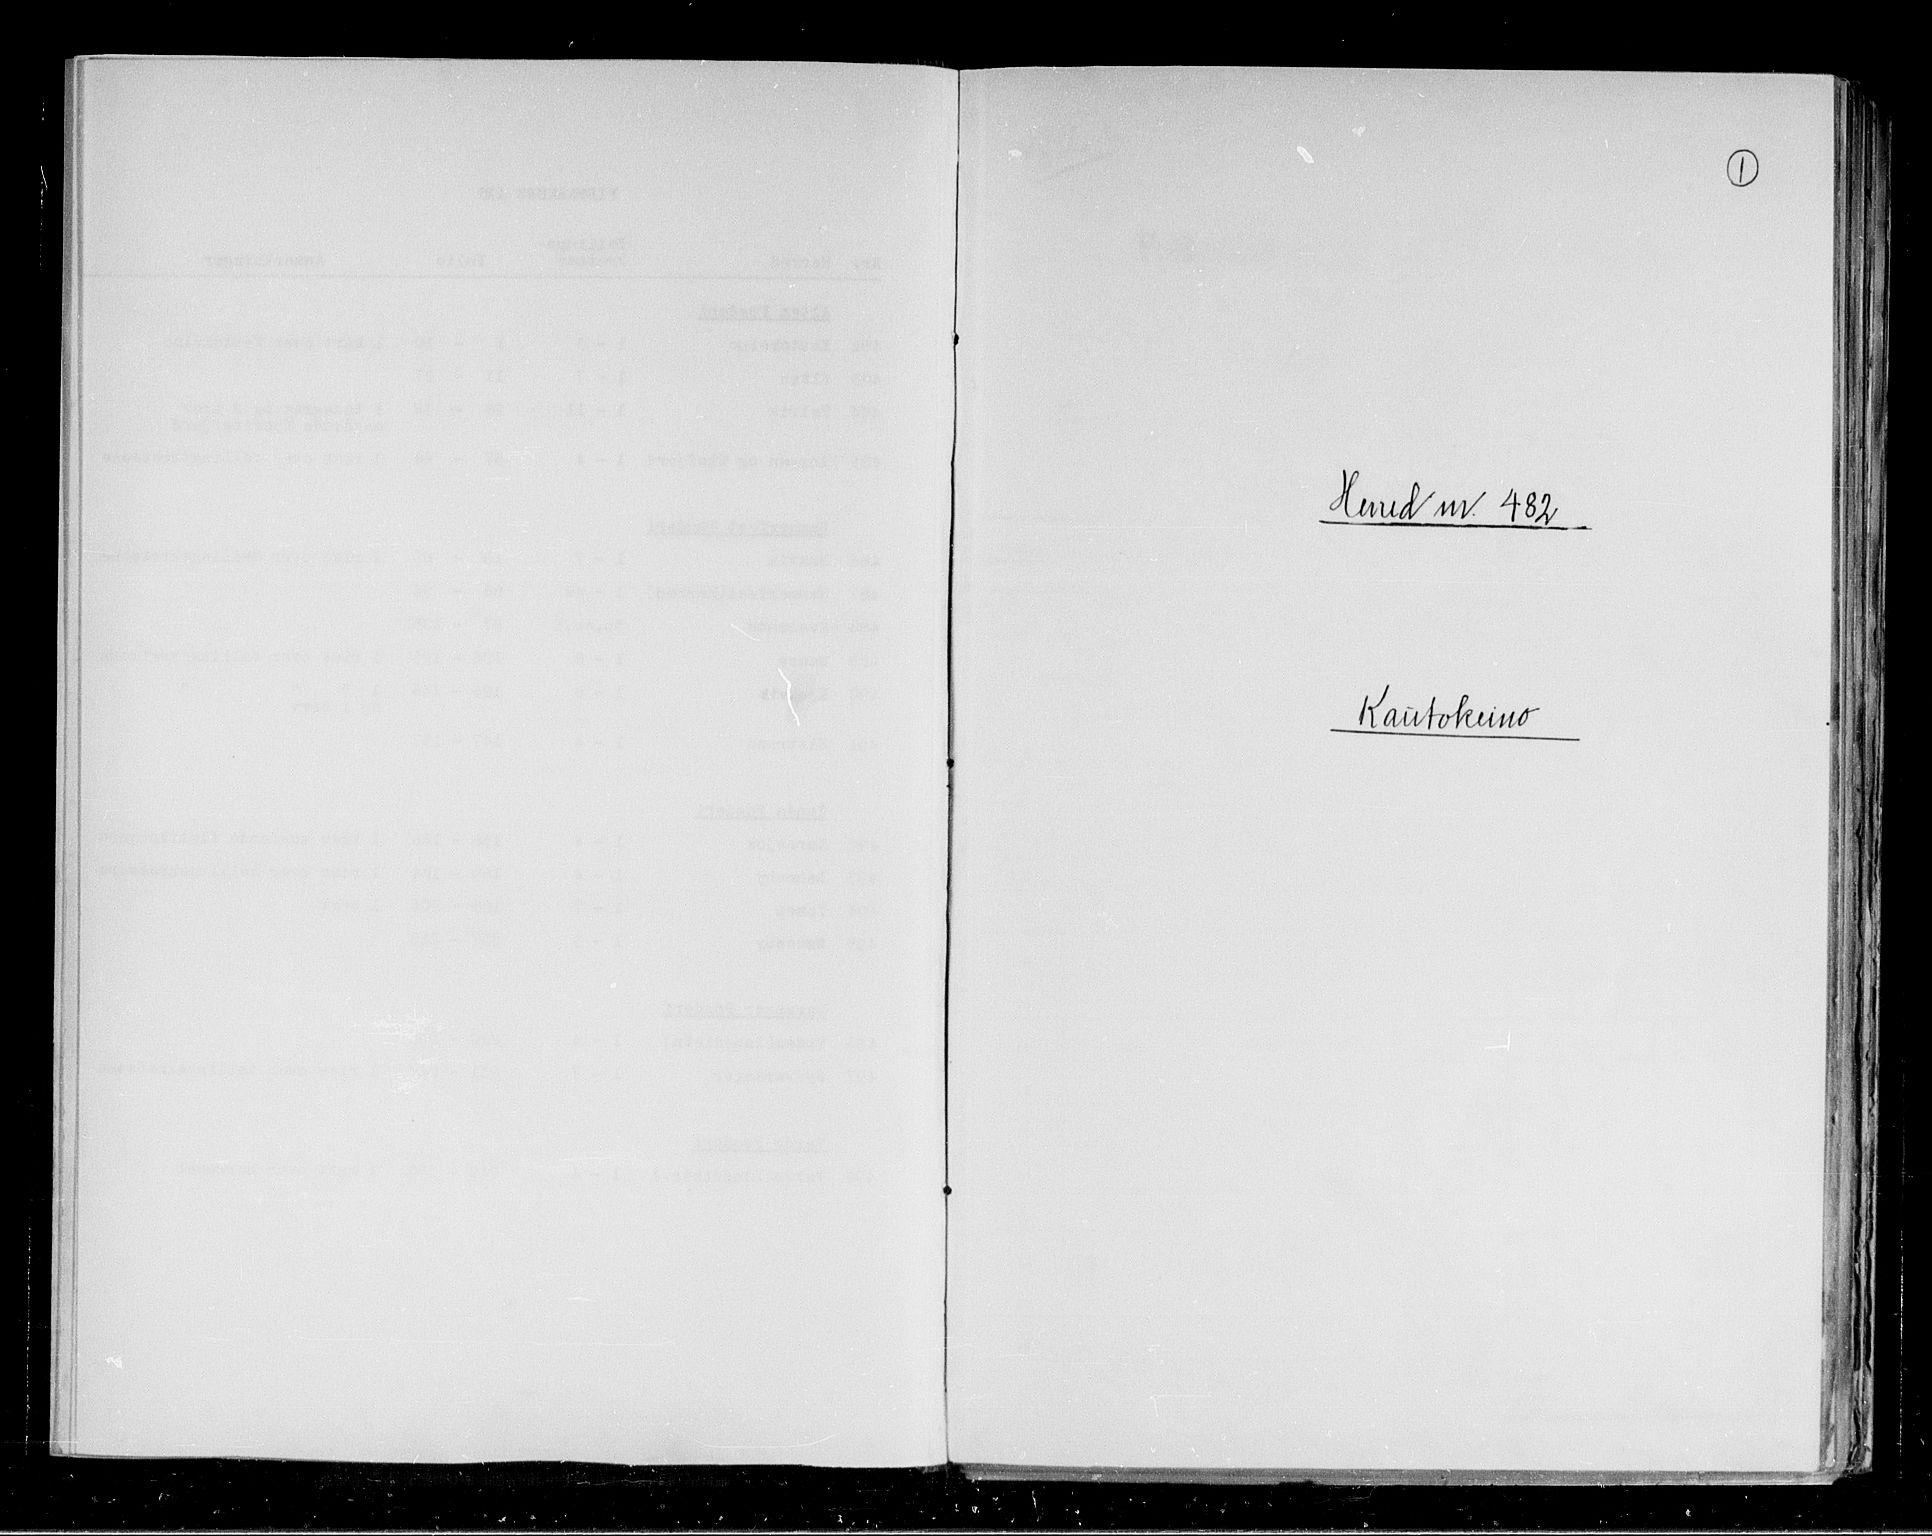 RA, Folketelling 1891 for 2011 Kautokeino herred, 1891, s. 1